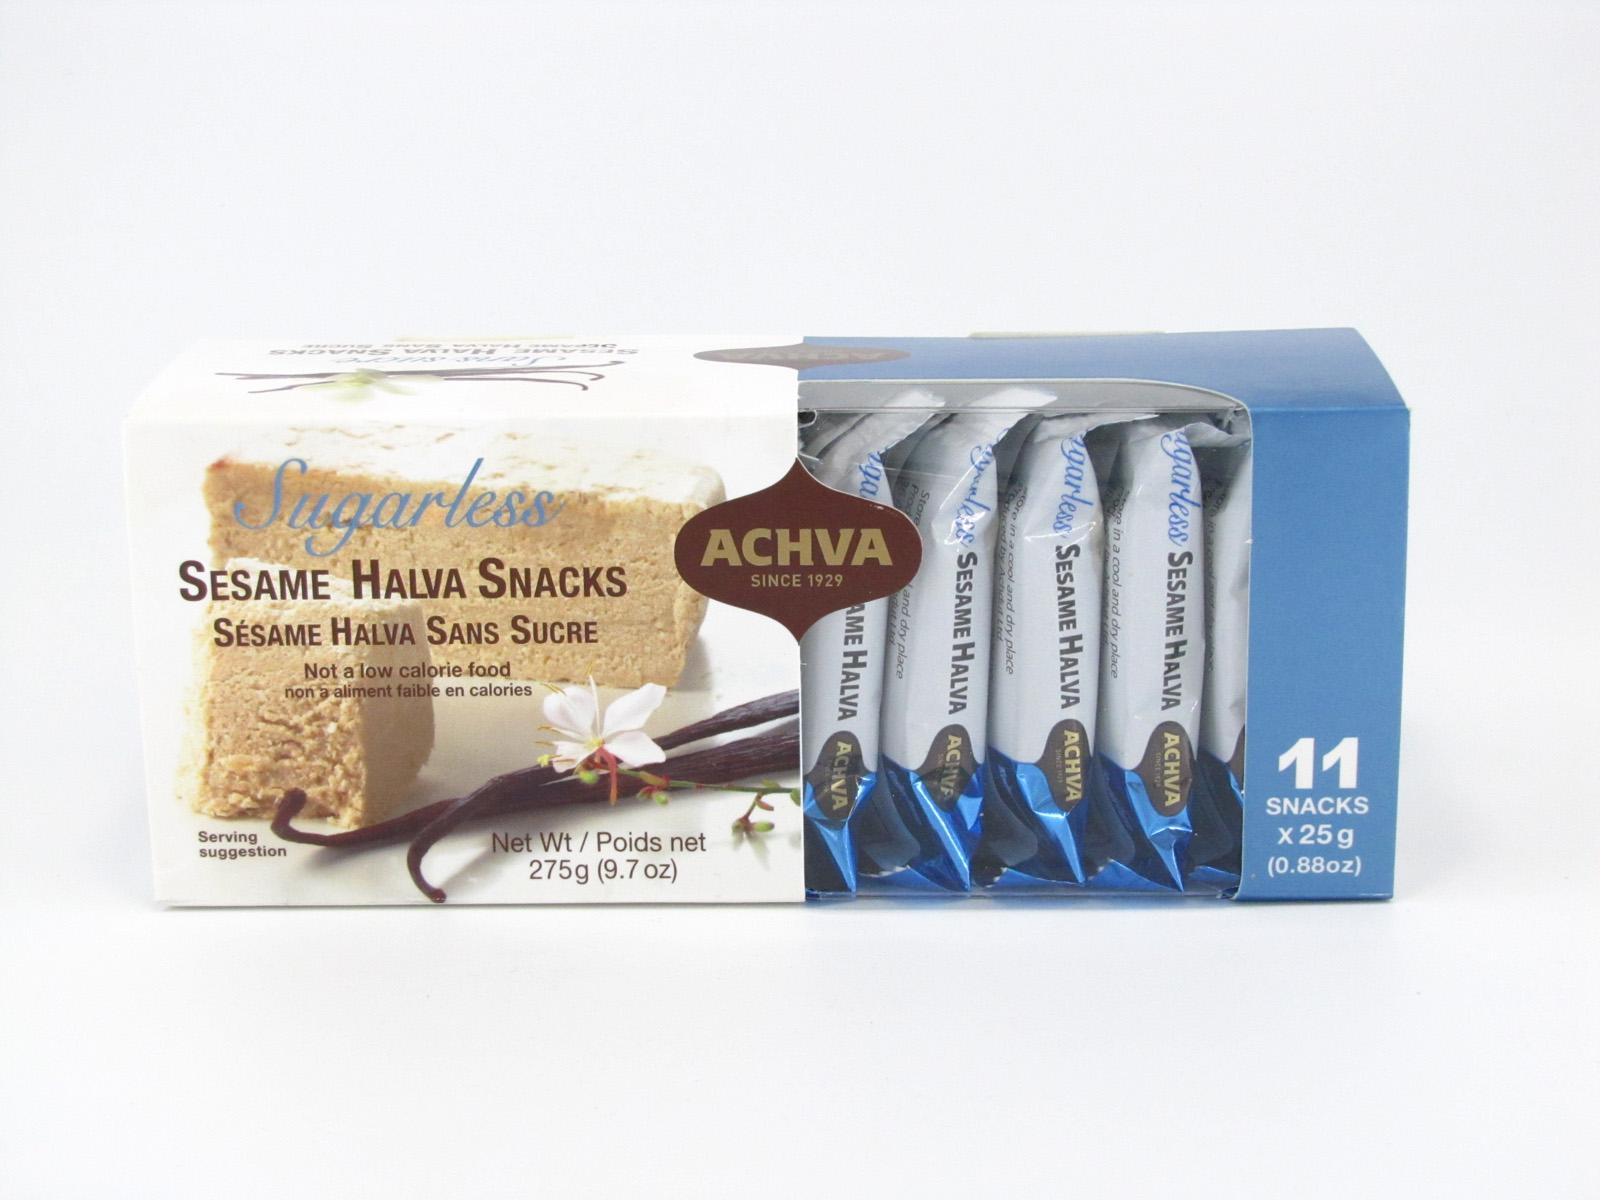 Achva Sesame Halva Snacks top of box image